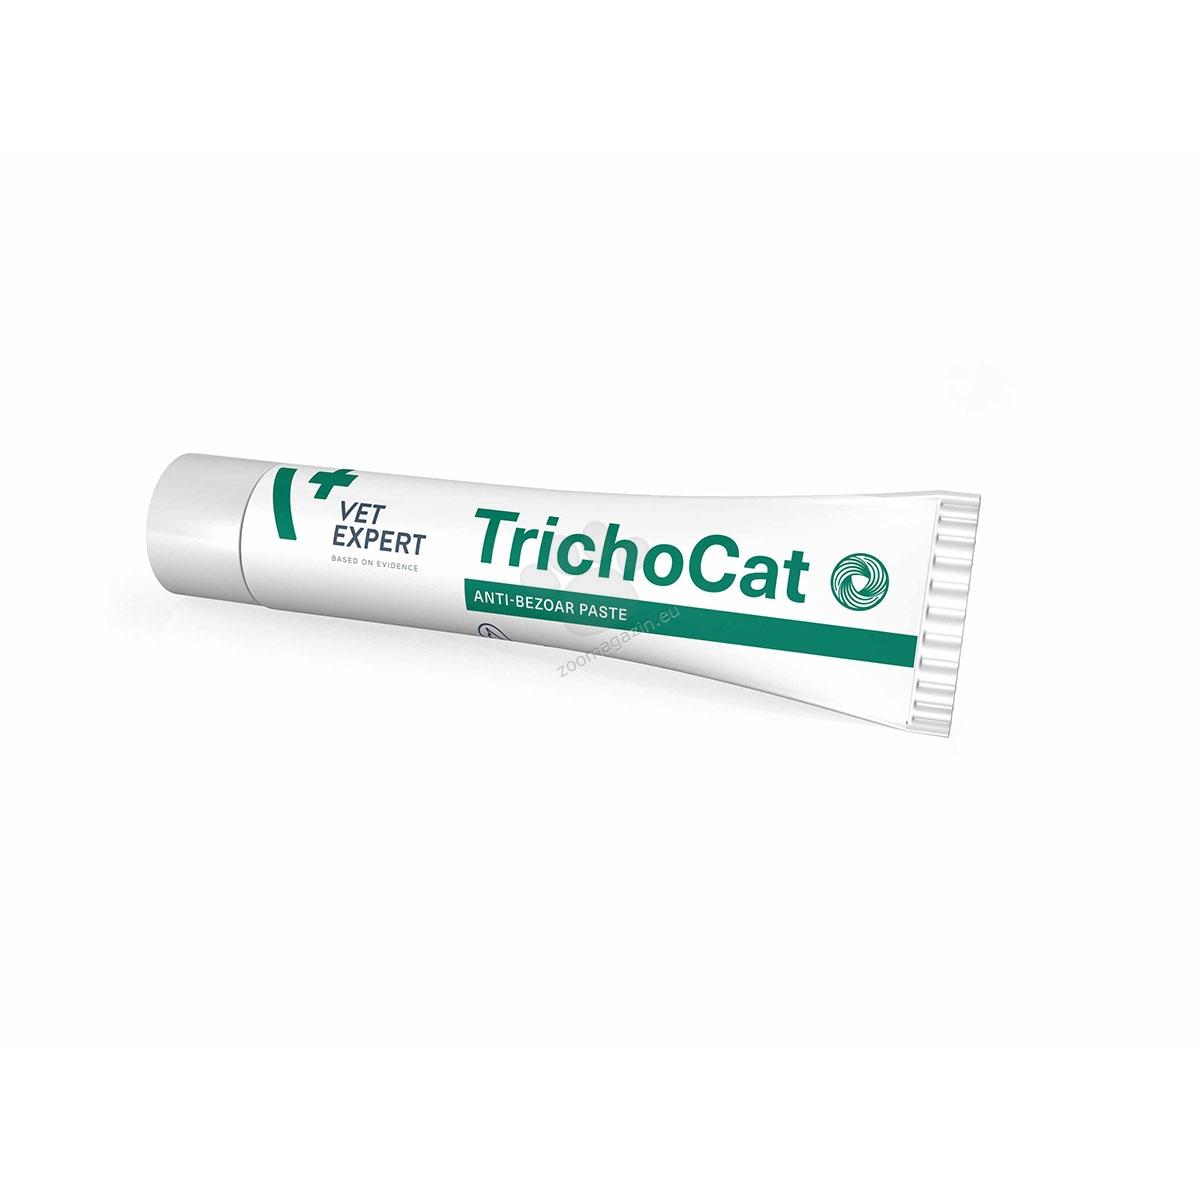 Vetexpert - TrichoCat - антибезоарна паста 120 гр.